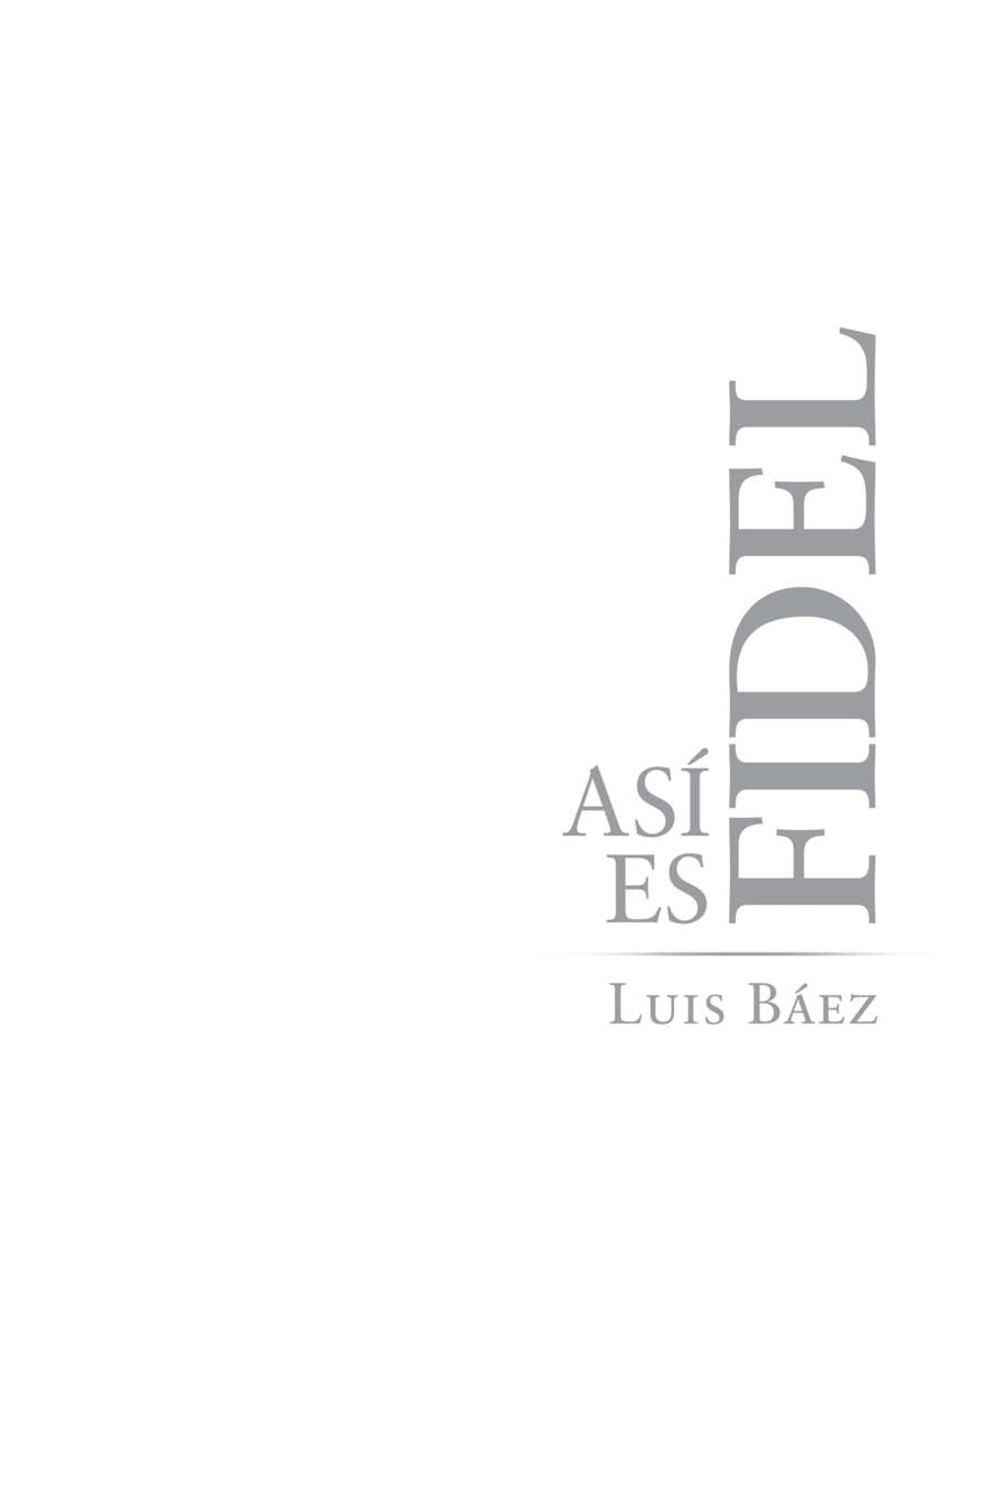 Calaméo - Báez, Luis .-. Así es Fidel